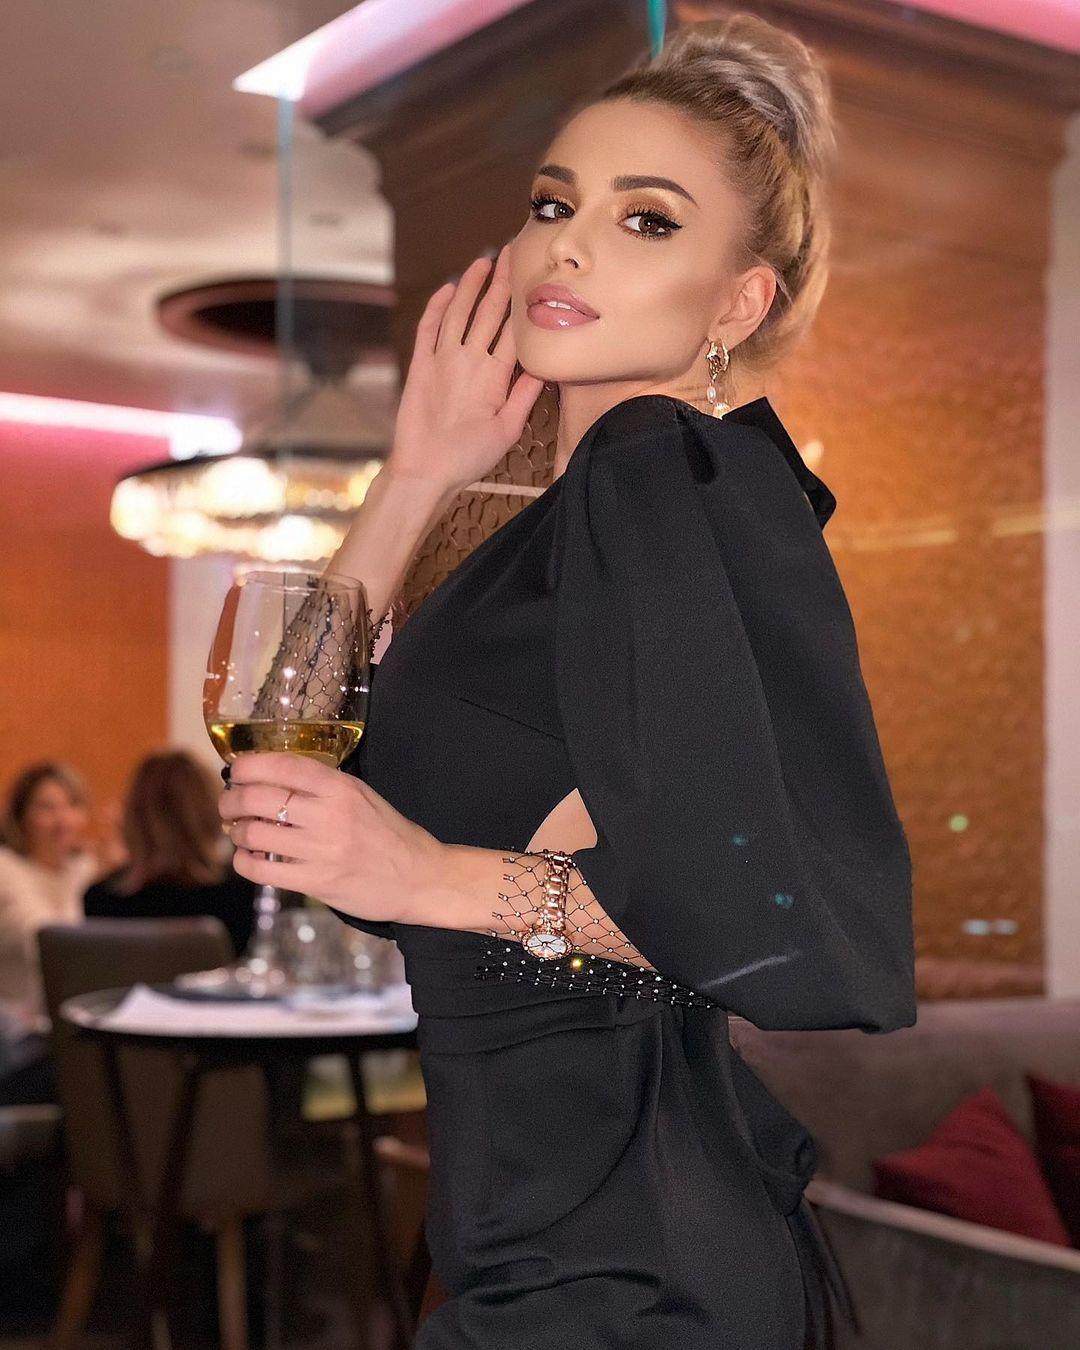 Anastasiya-Timonina-Wallpapers-Insta-Fit-Bio-10